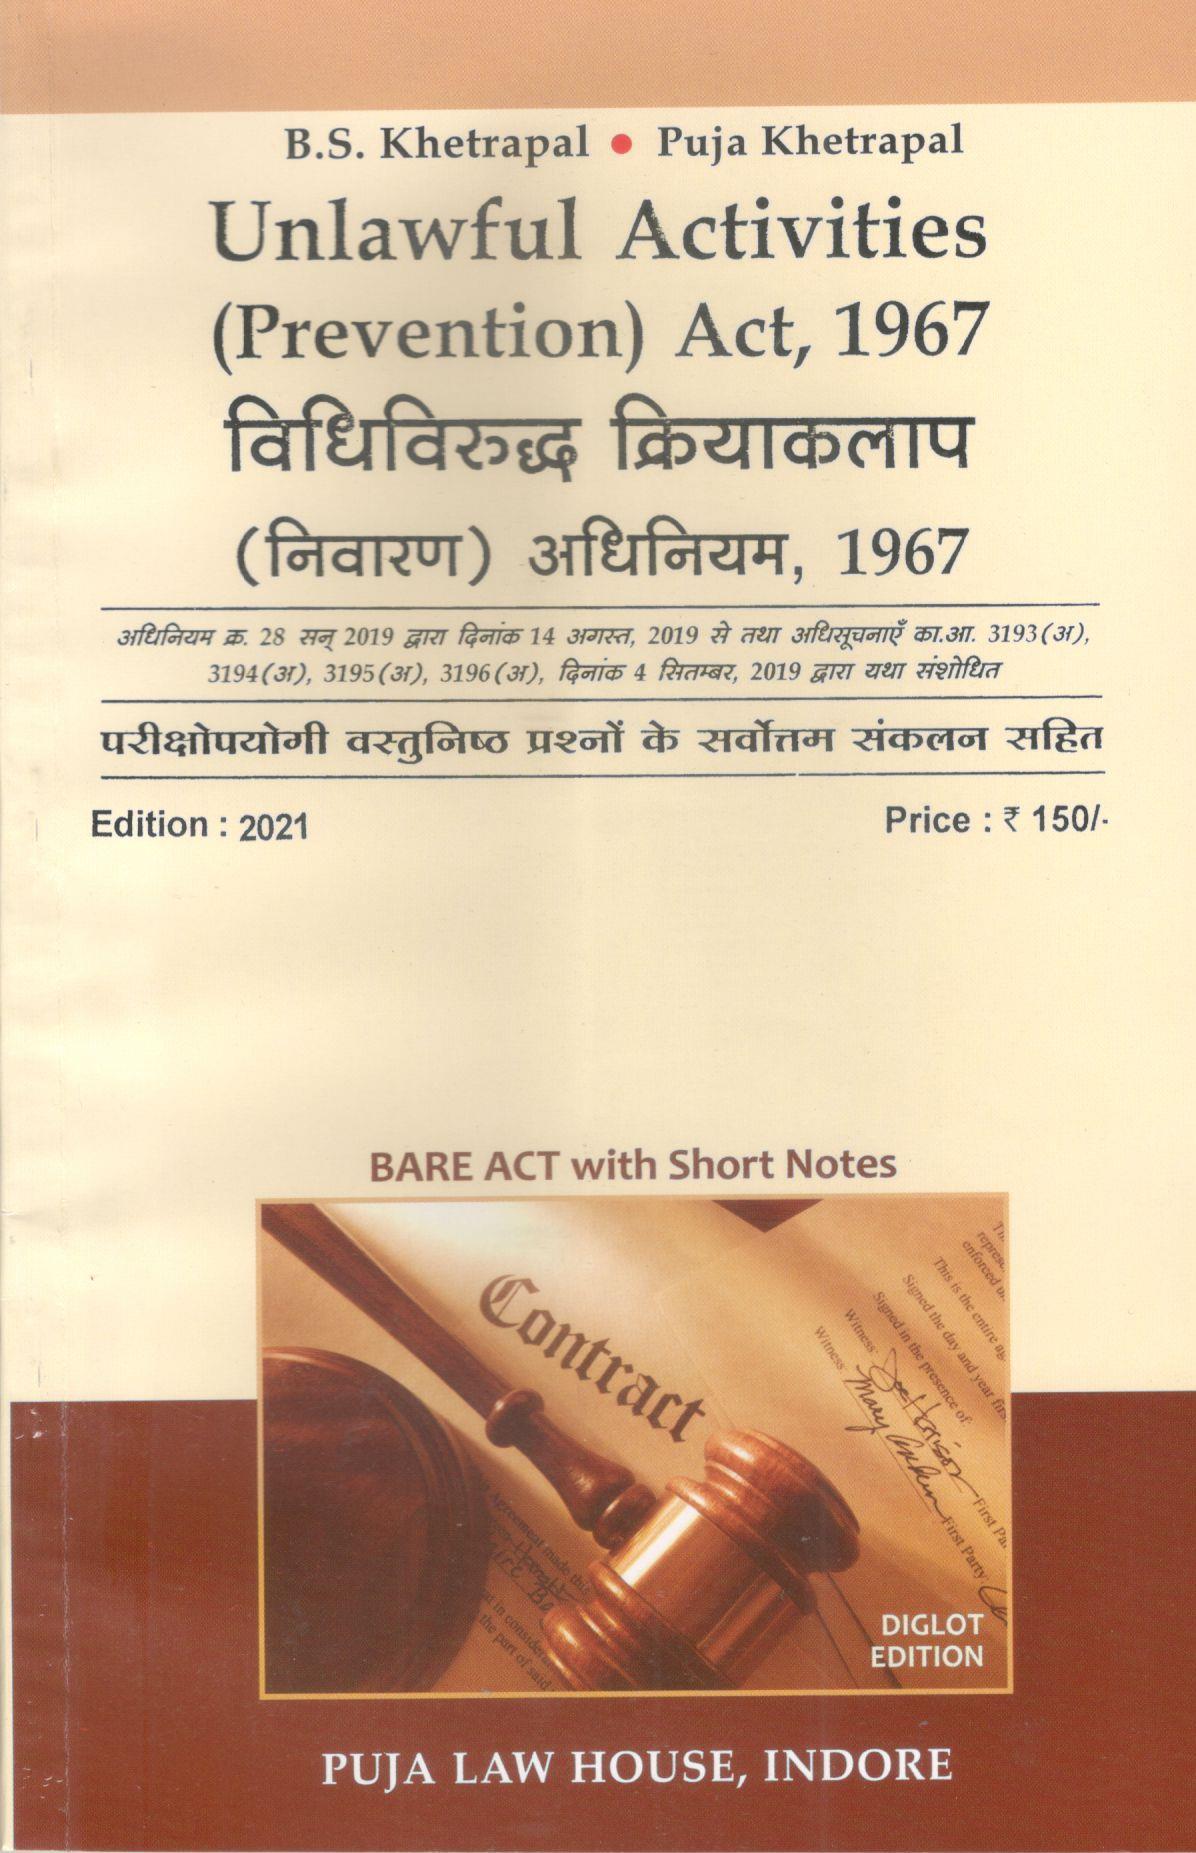 Unlawful Activities (Prevention) Act, 1967  / विधिविरुद्ध क्रियाकलाप (निवारण) अधिनियम, 1967